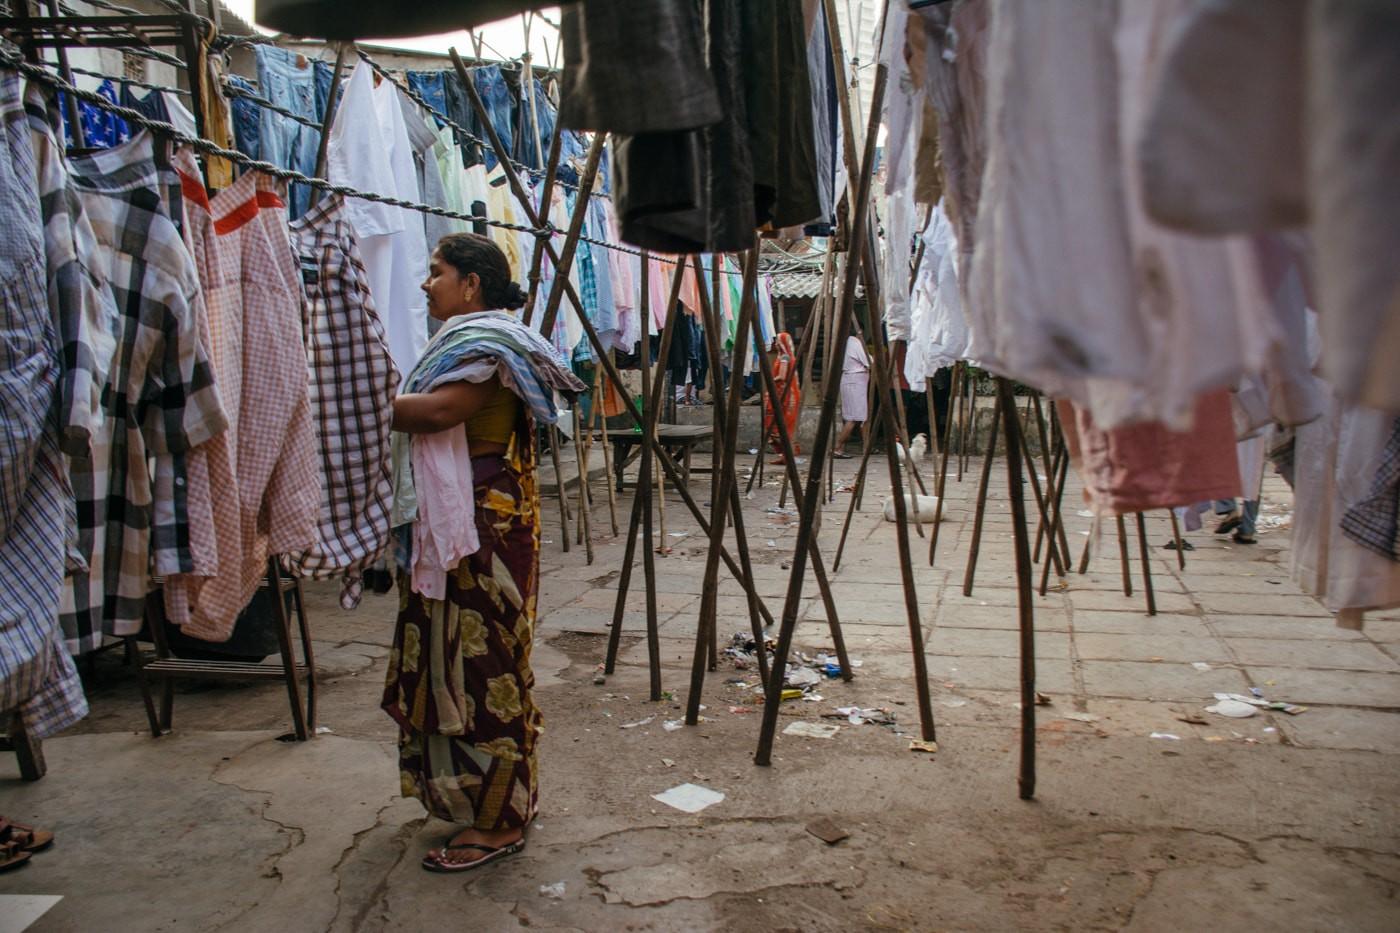 Behind the Scenes at Mumbai's 140-Year-Old Dhobi Ghat